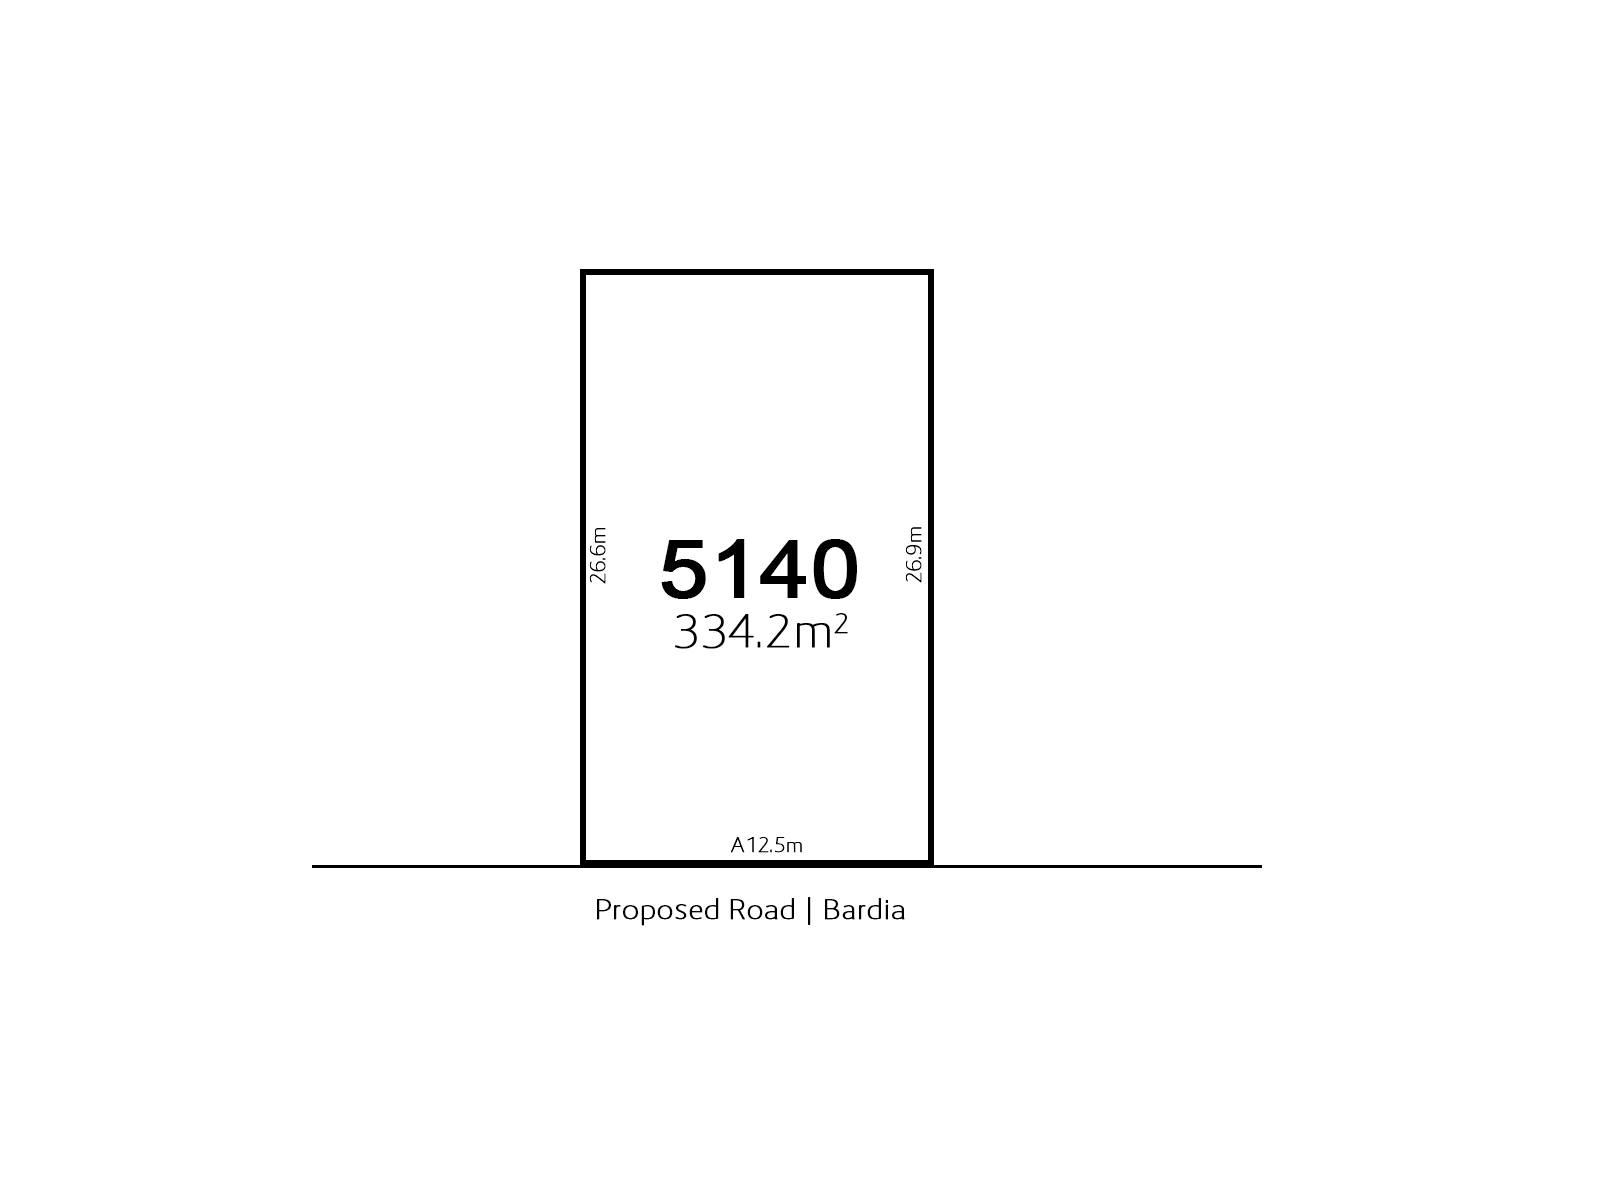 Bardia LOT 5140 Proposed Road | Bardia